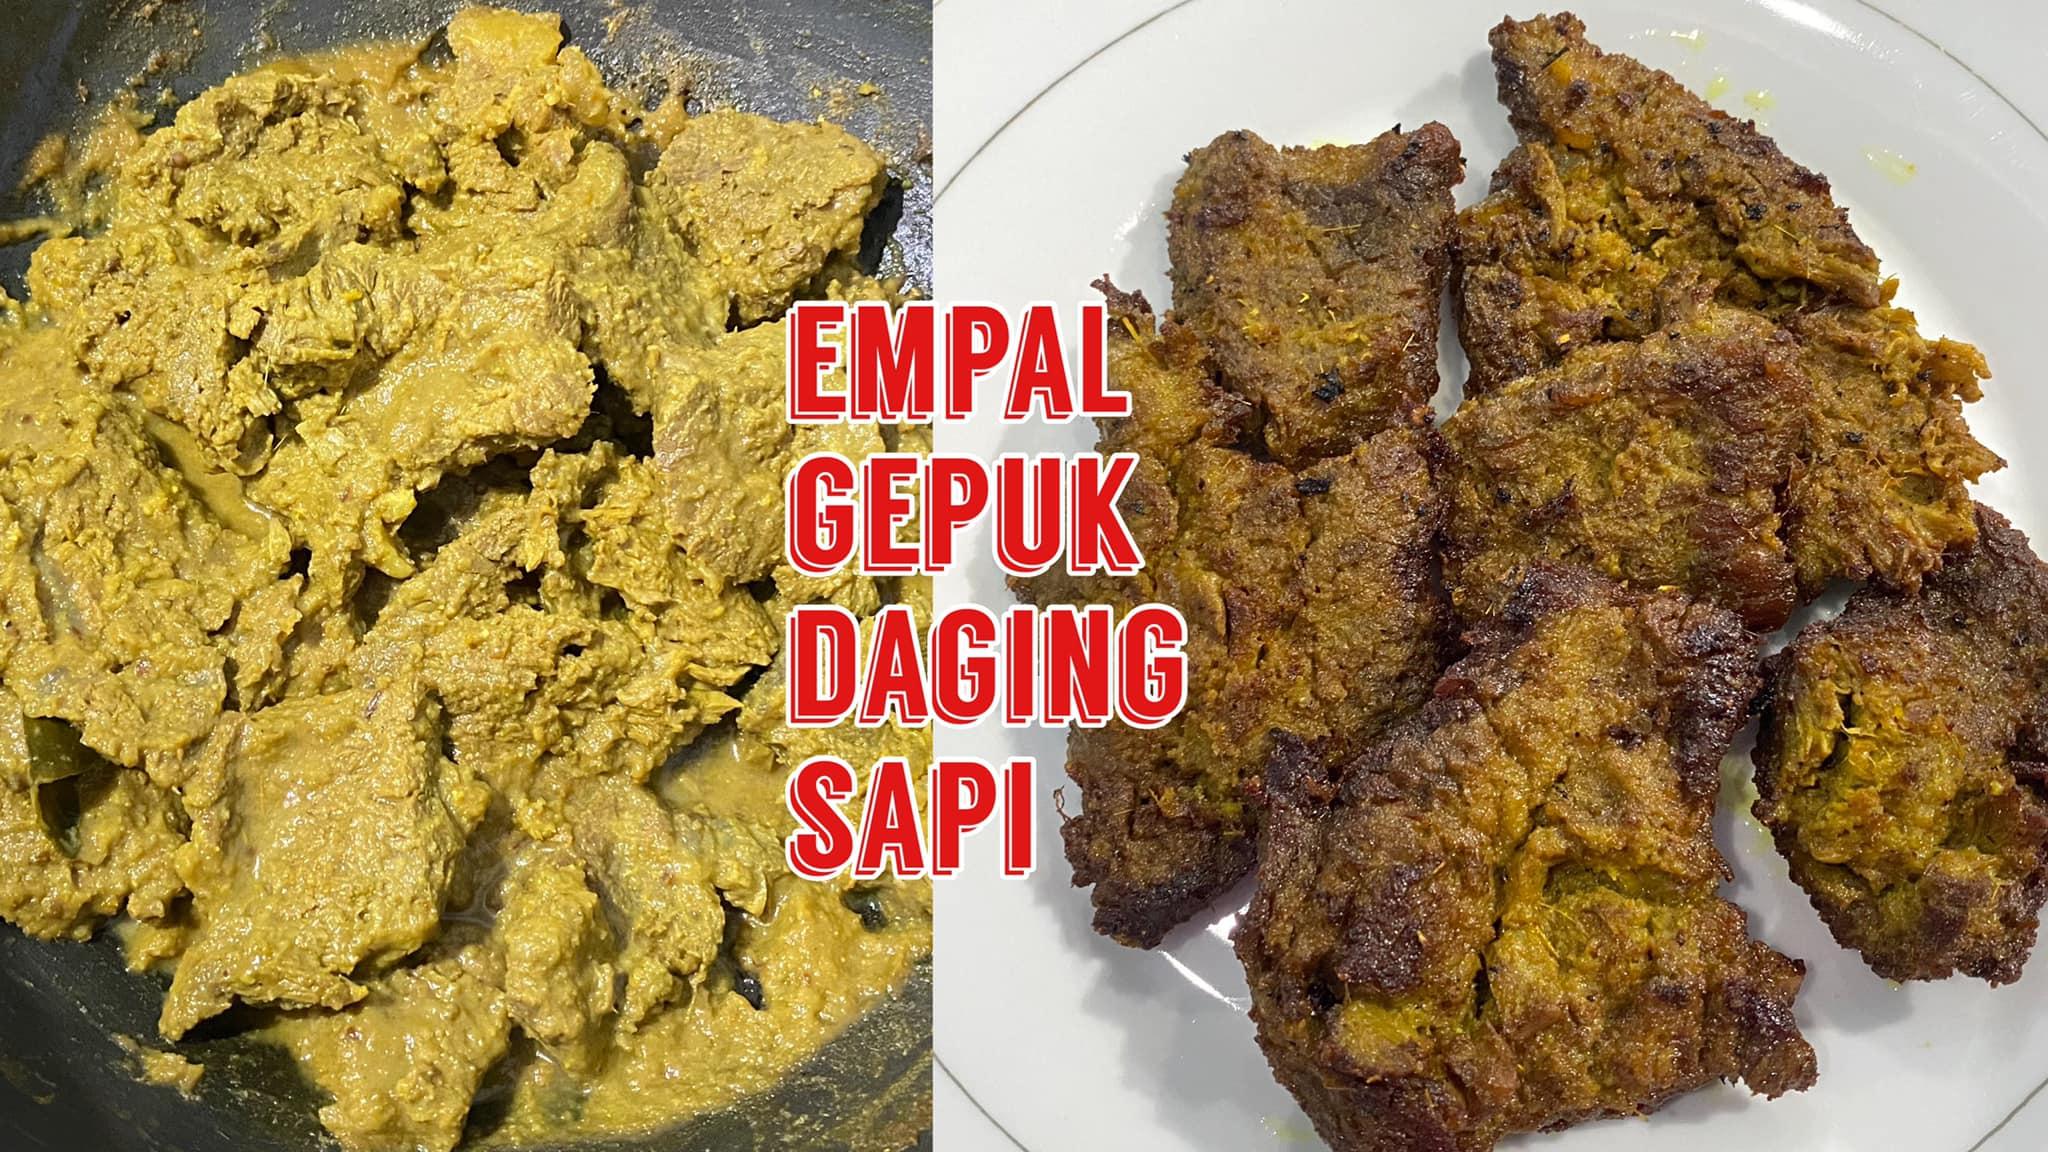 Empal gepuk daging sapi by Fitriatul Muniroh